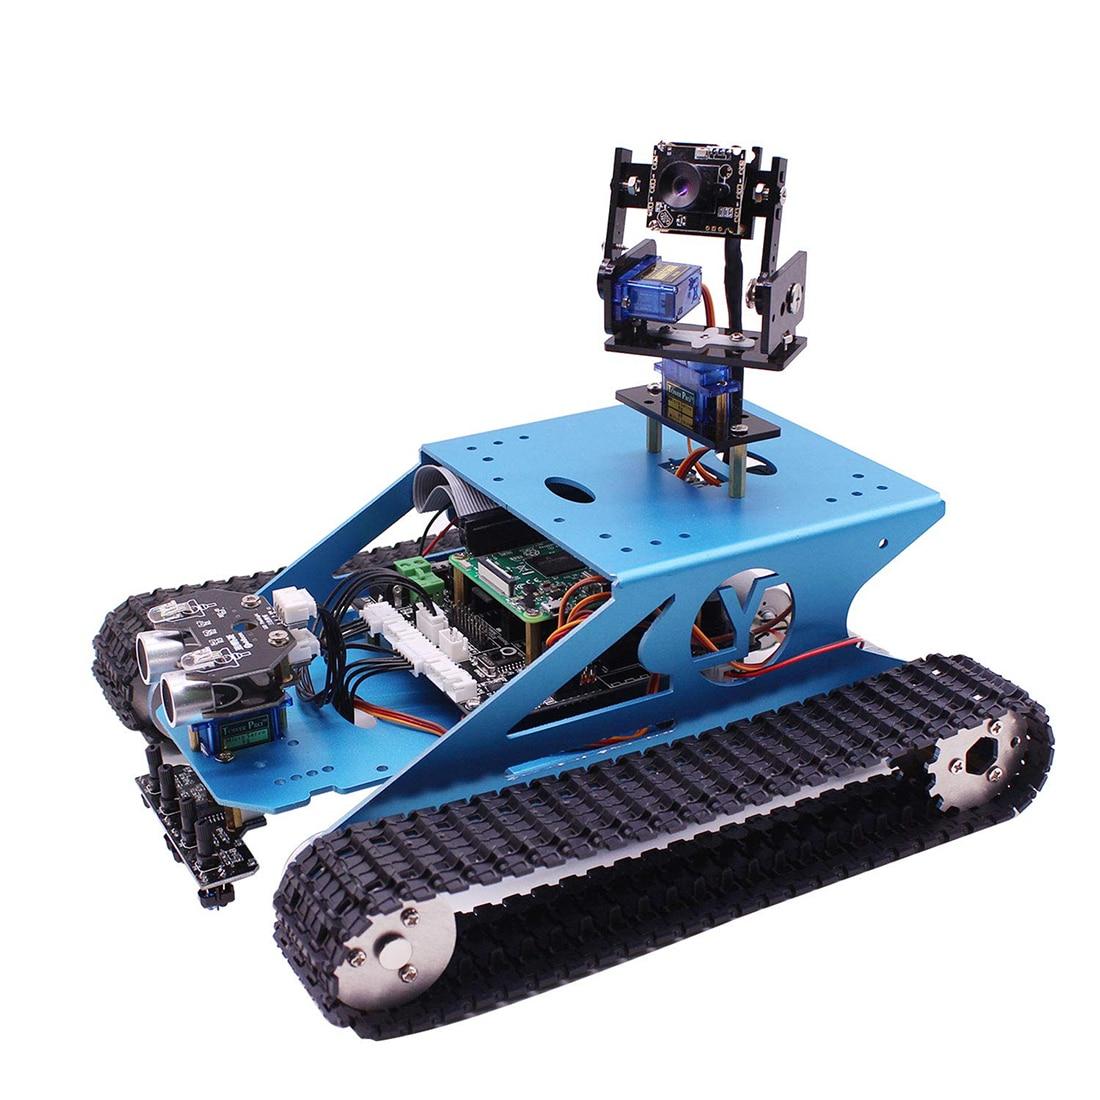 Professional Raspberry Pi Tank Programming Robotic Kit WiFi Wireless Video Electronic Toy DIY Kit For Kids Compatible RPI 3B/3B+